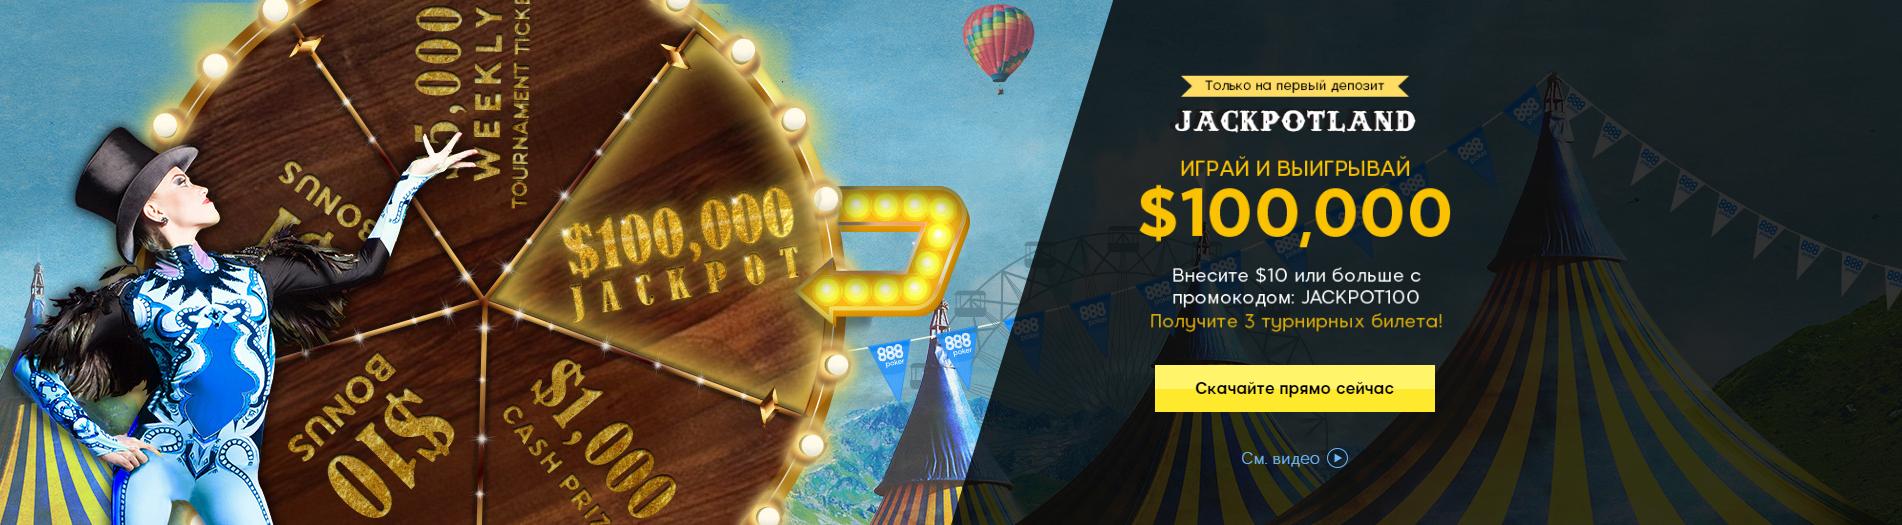 Акция Jackpotland возвращается на 888Poker